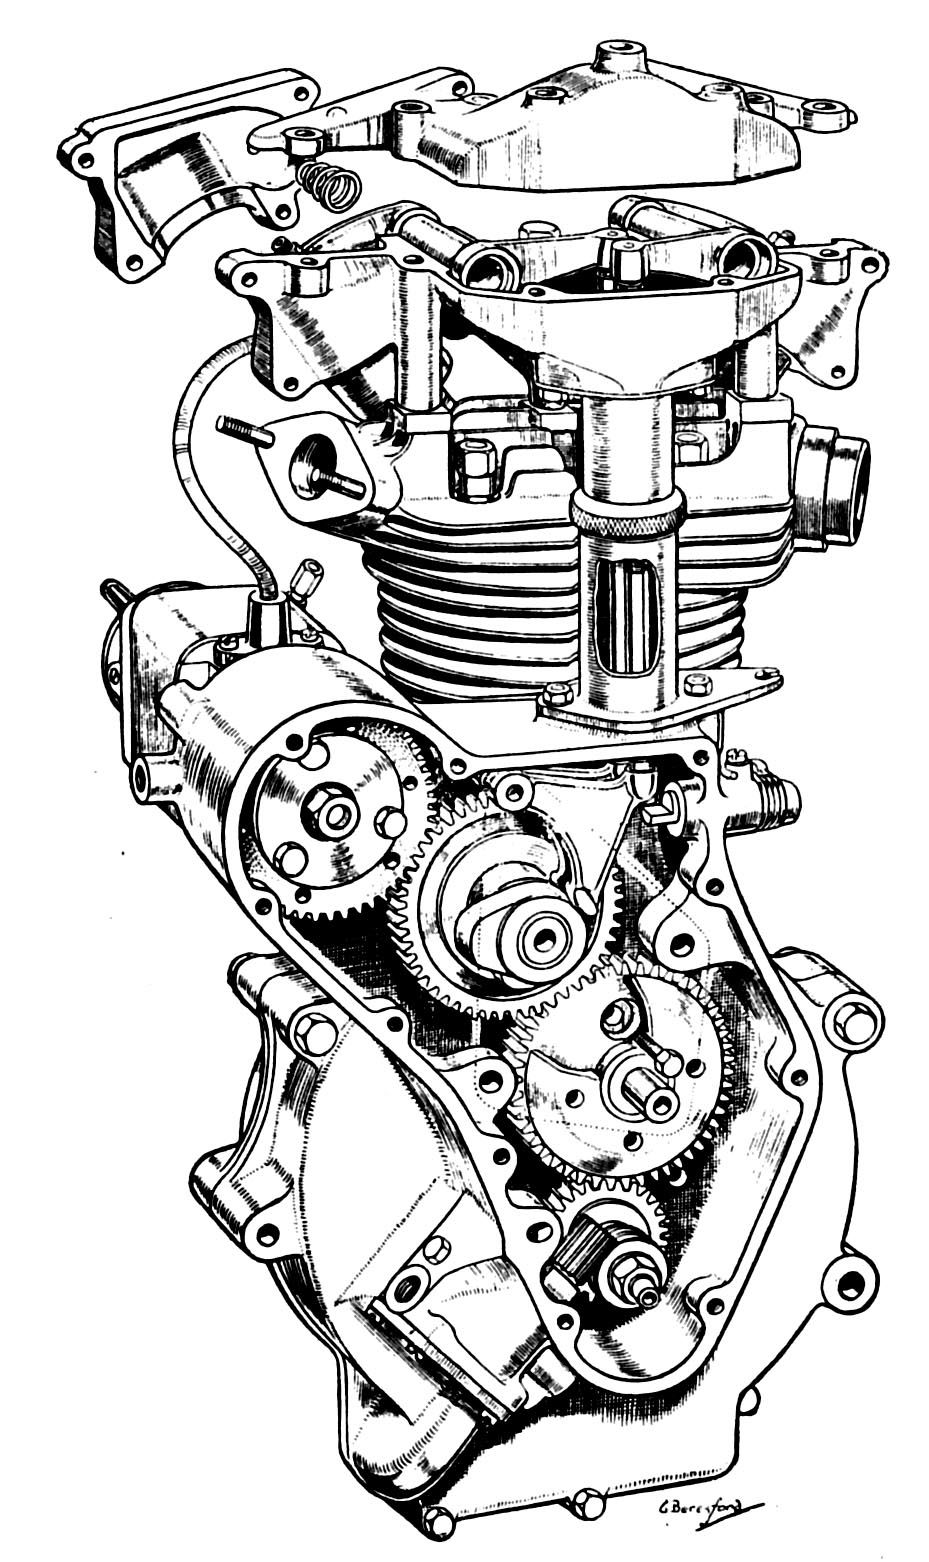 Cutaway view of the 1973 Kawasaki Z1 900 engine